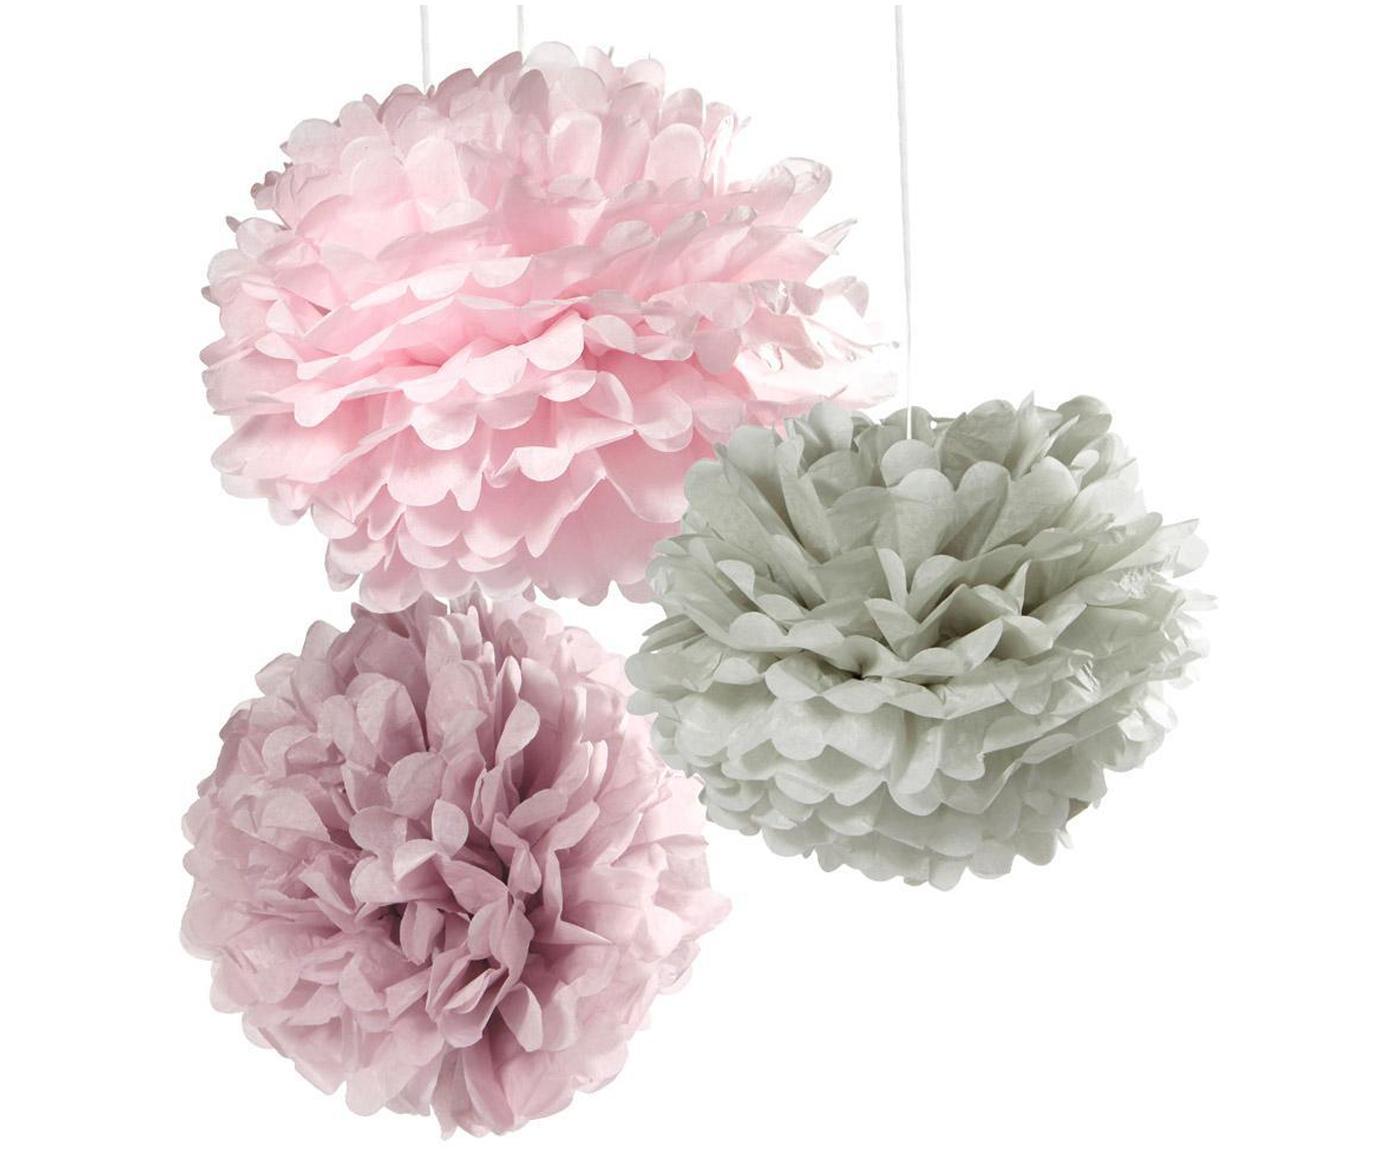 Set pompon Decadent, 3 pz., Carta, Rosa, grigio, lilla, Diverse dimensioni